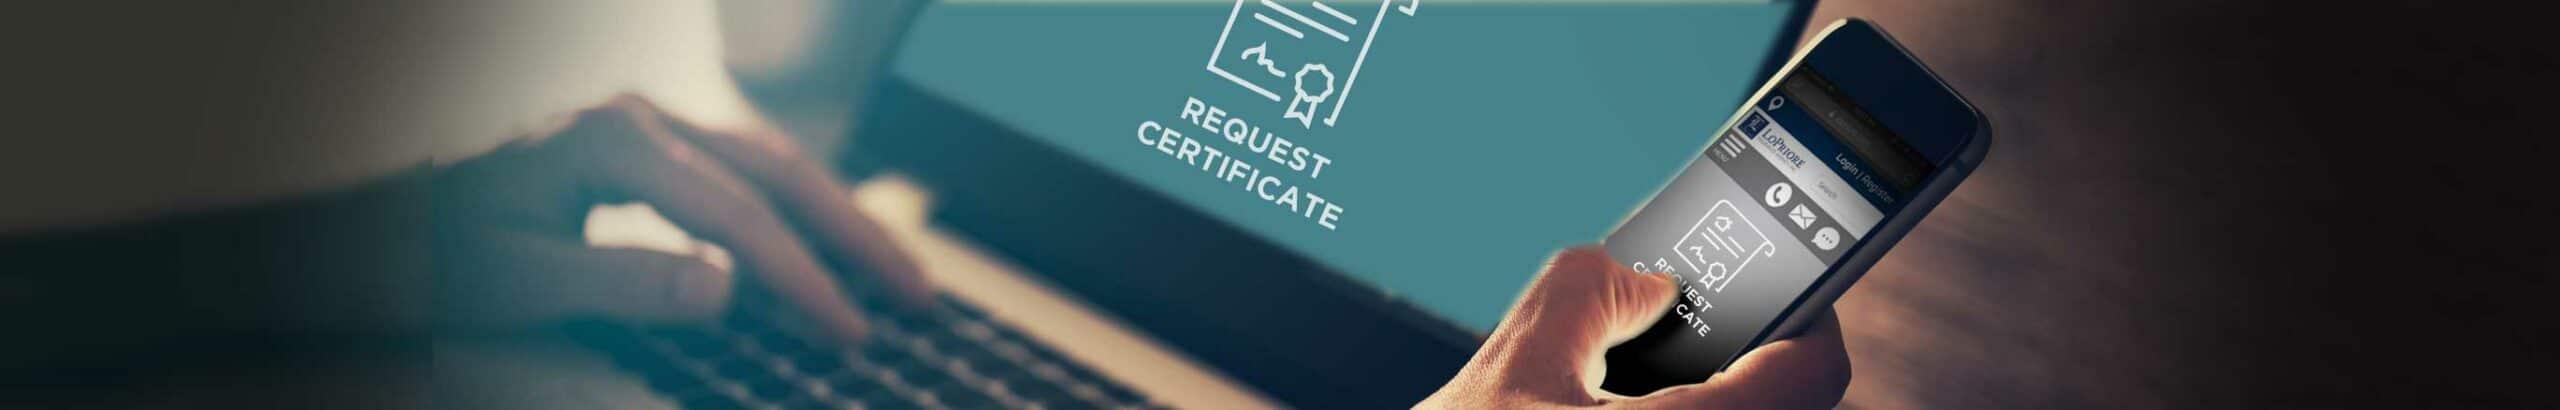 insurance_certificate_landing_page_image